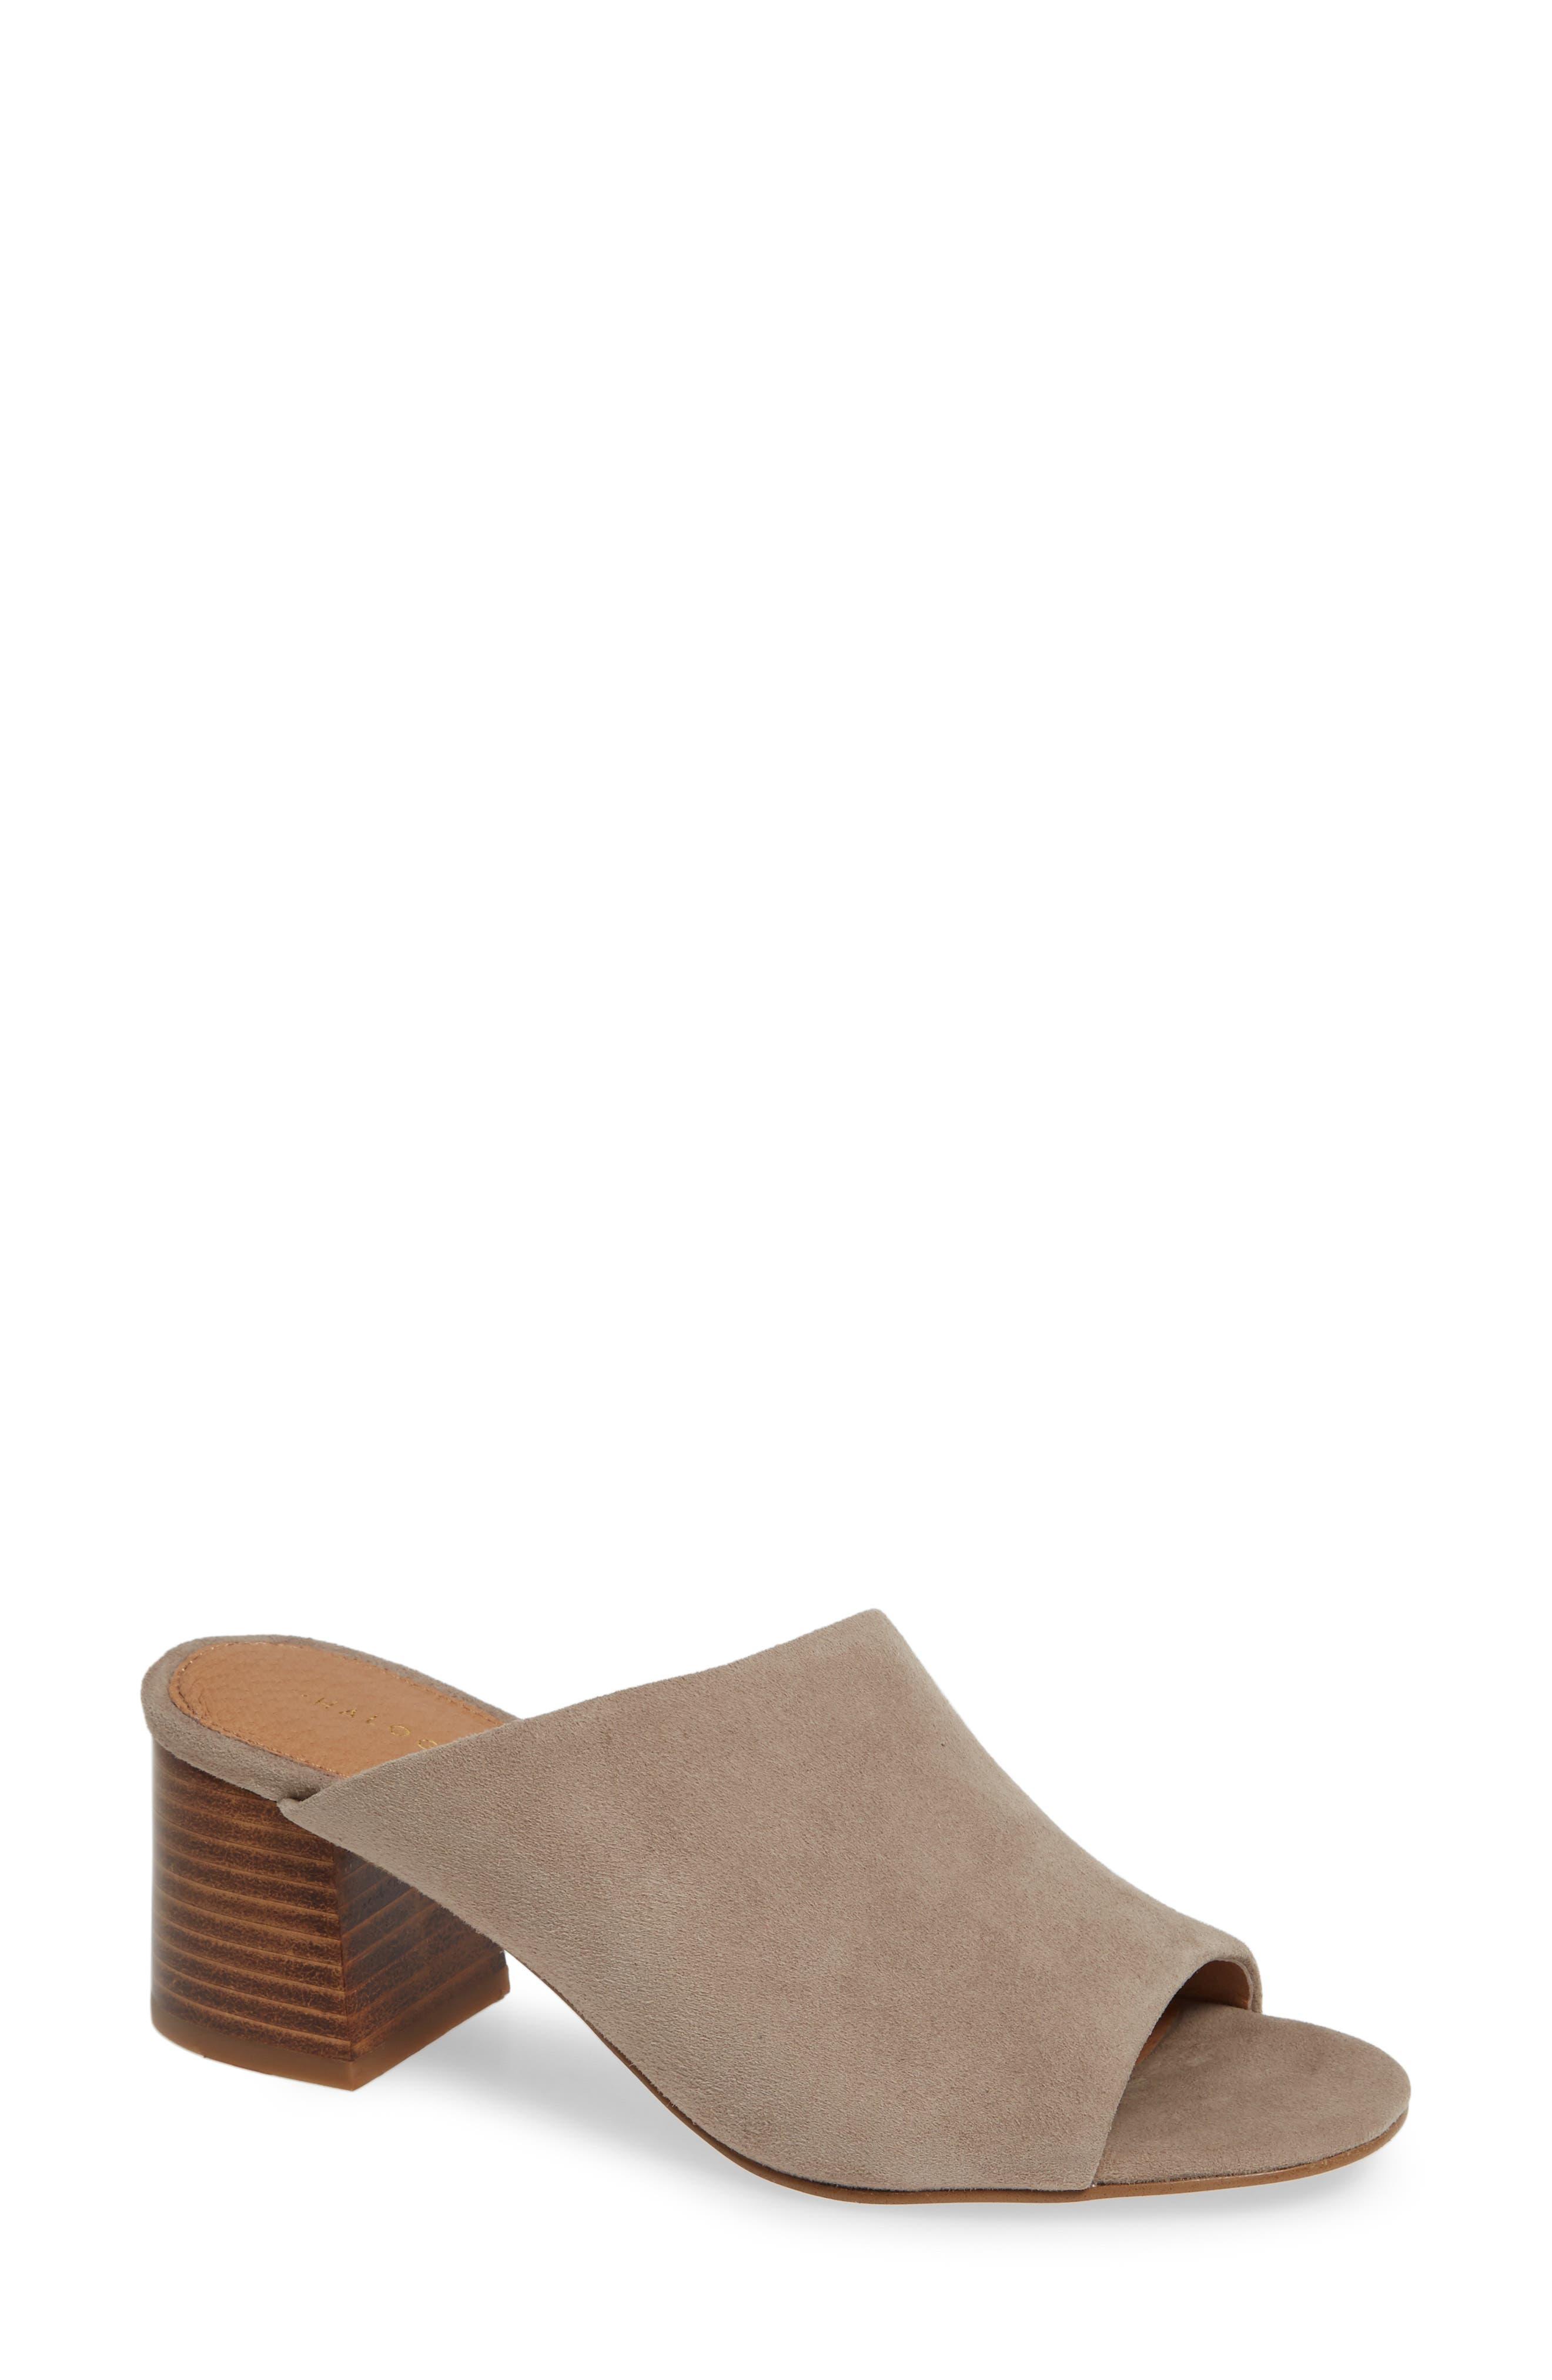 bc3cecefa08 Women s Halogen® Sandals